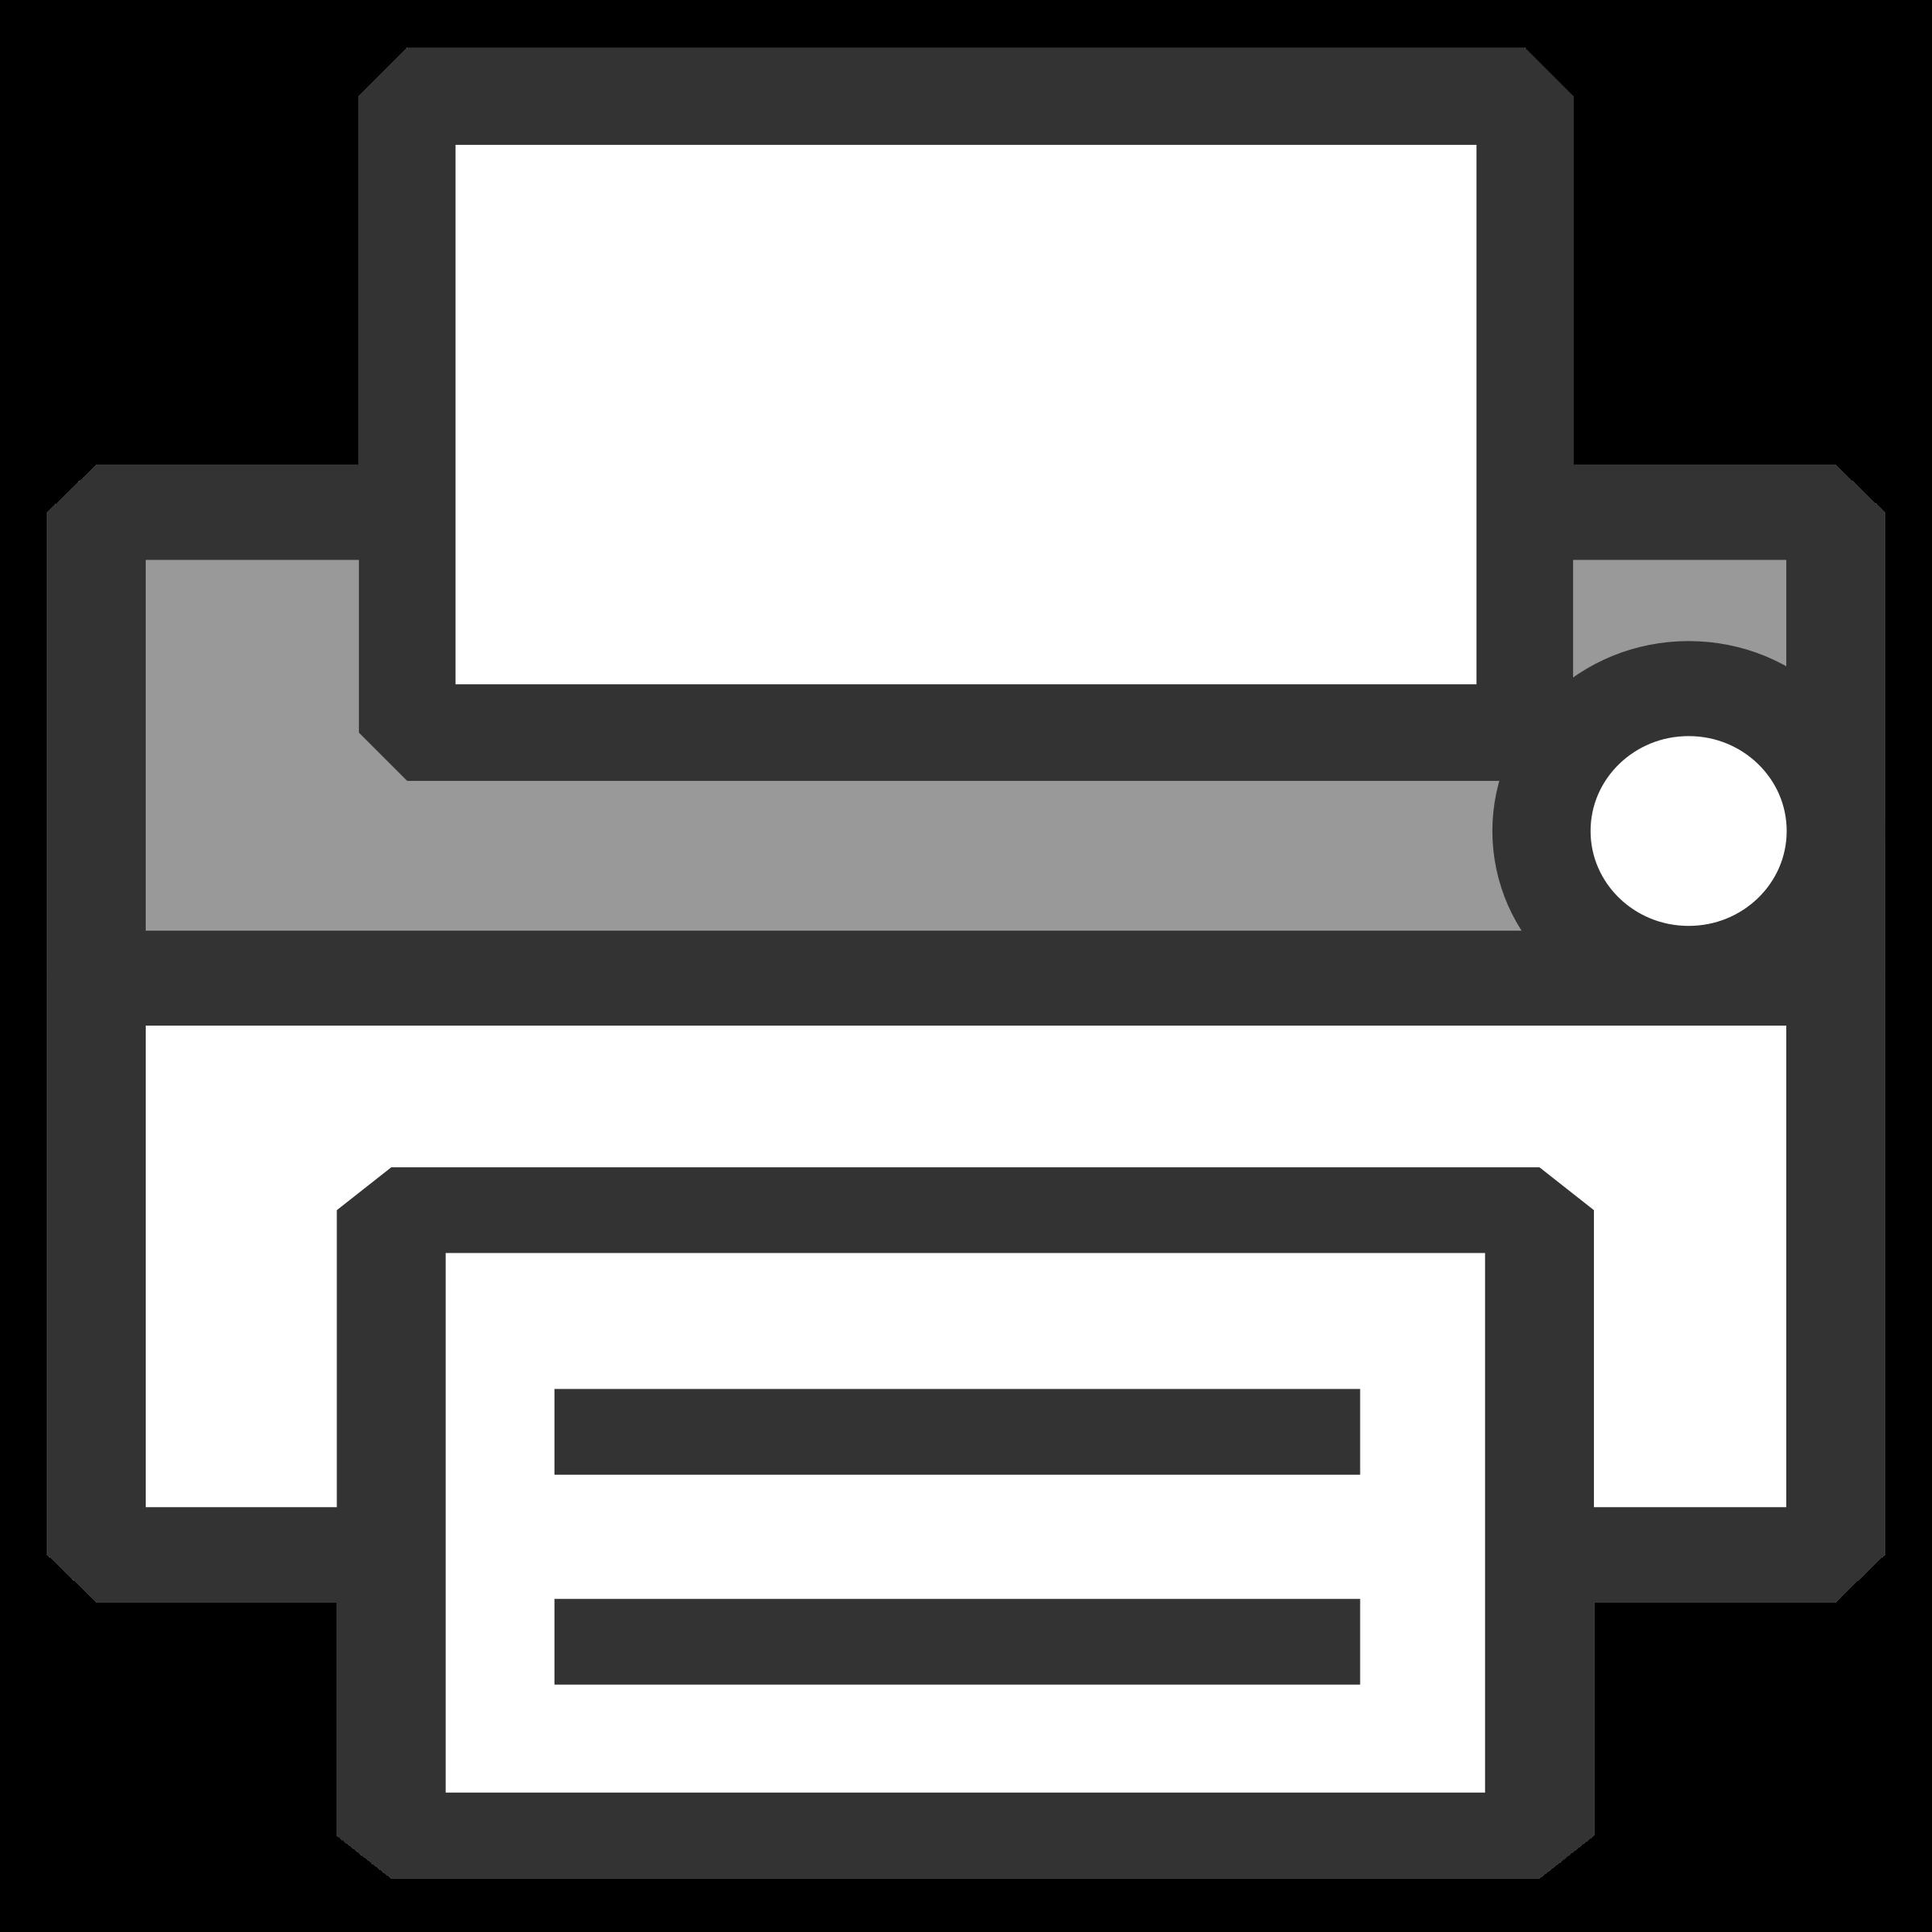 vector royalty free Printer clipart. Icon big image png.